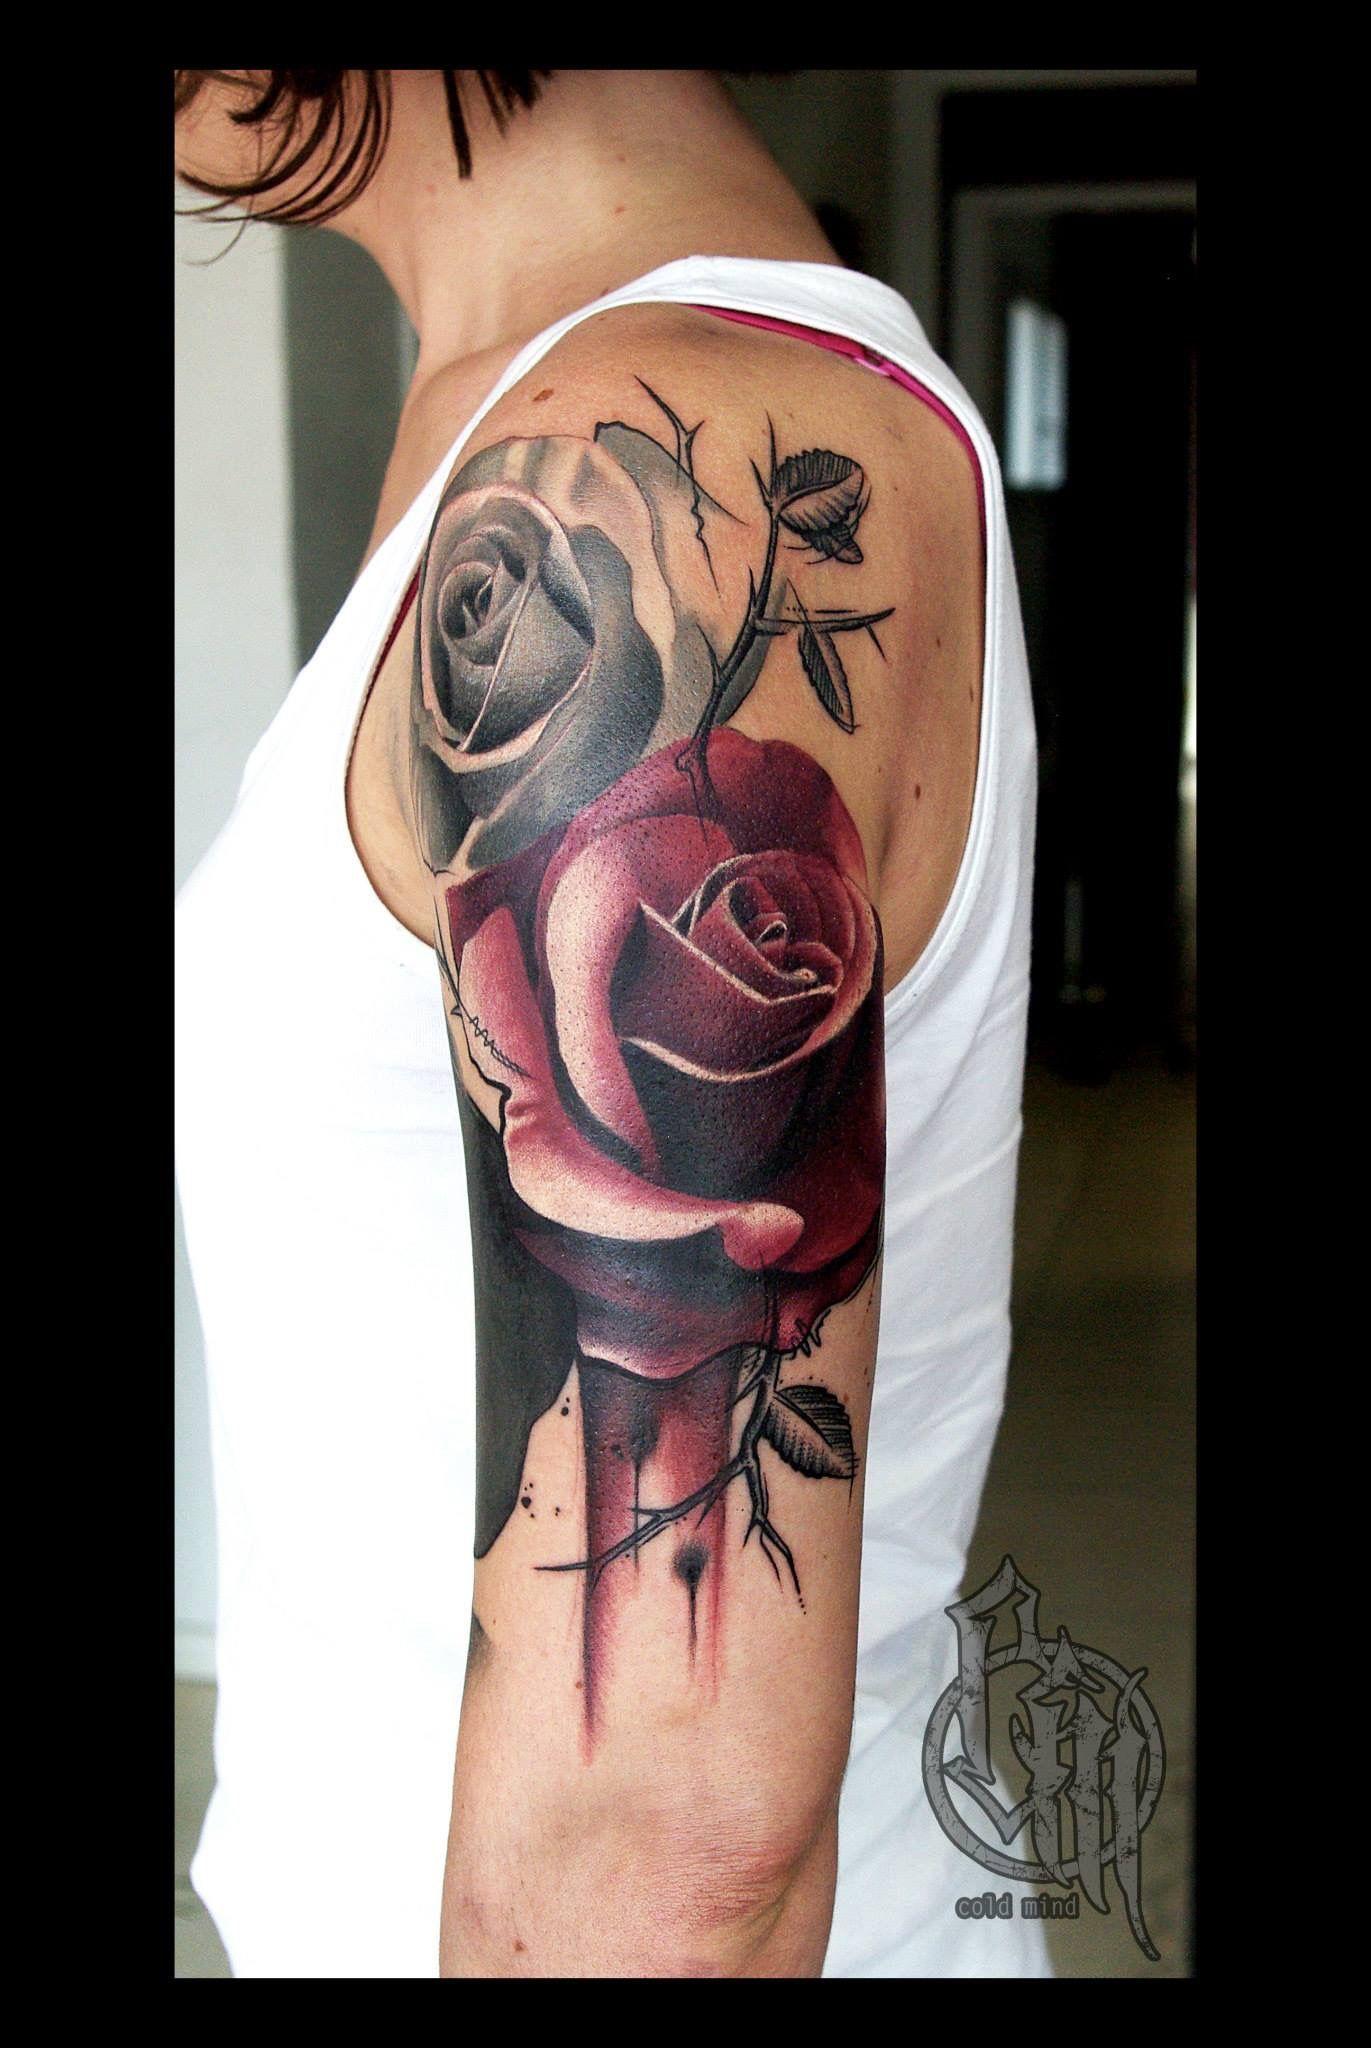 Pin by HM Lam on flower tattoo Tattoos, Flower tattoo